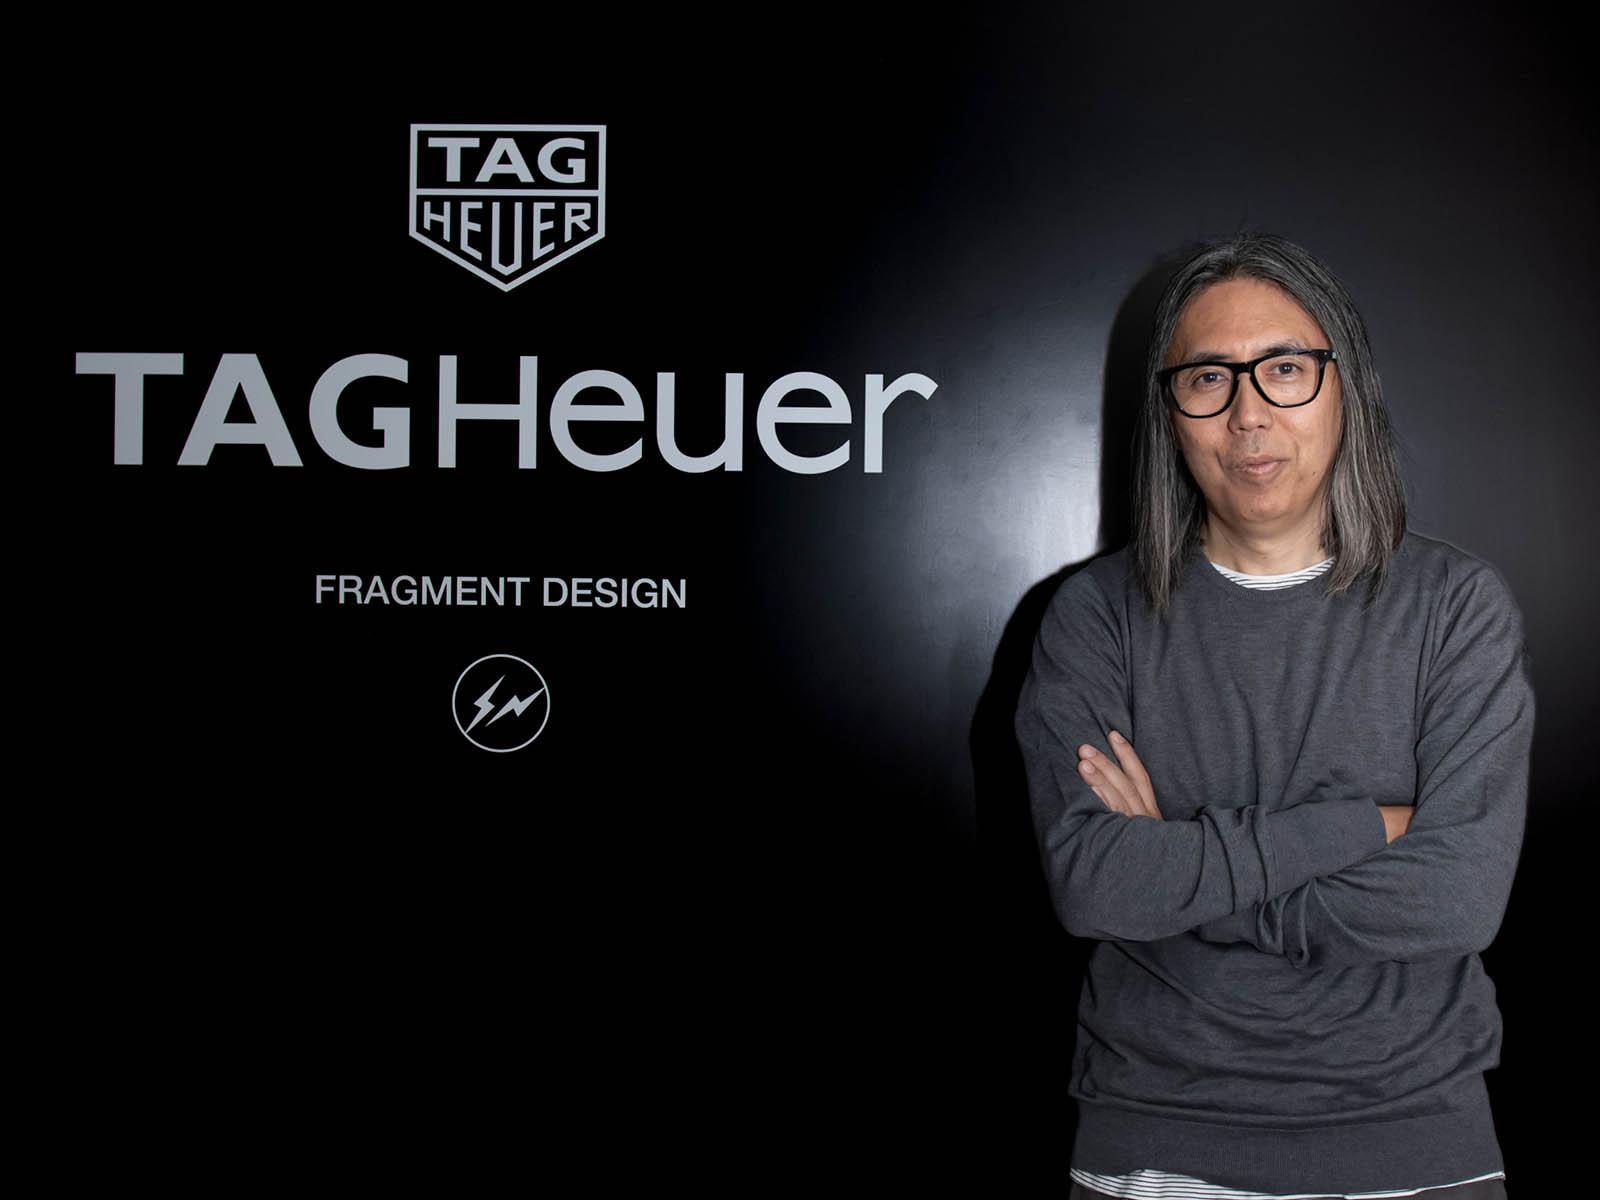 caz201a-ba0641-tag-heuer-x-fragment-design-heuer-02-10.jpg